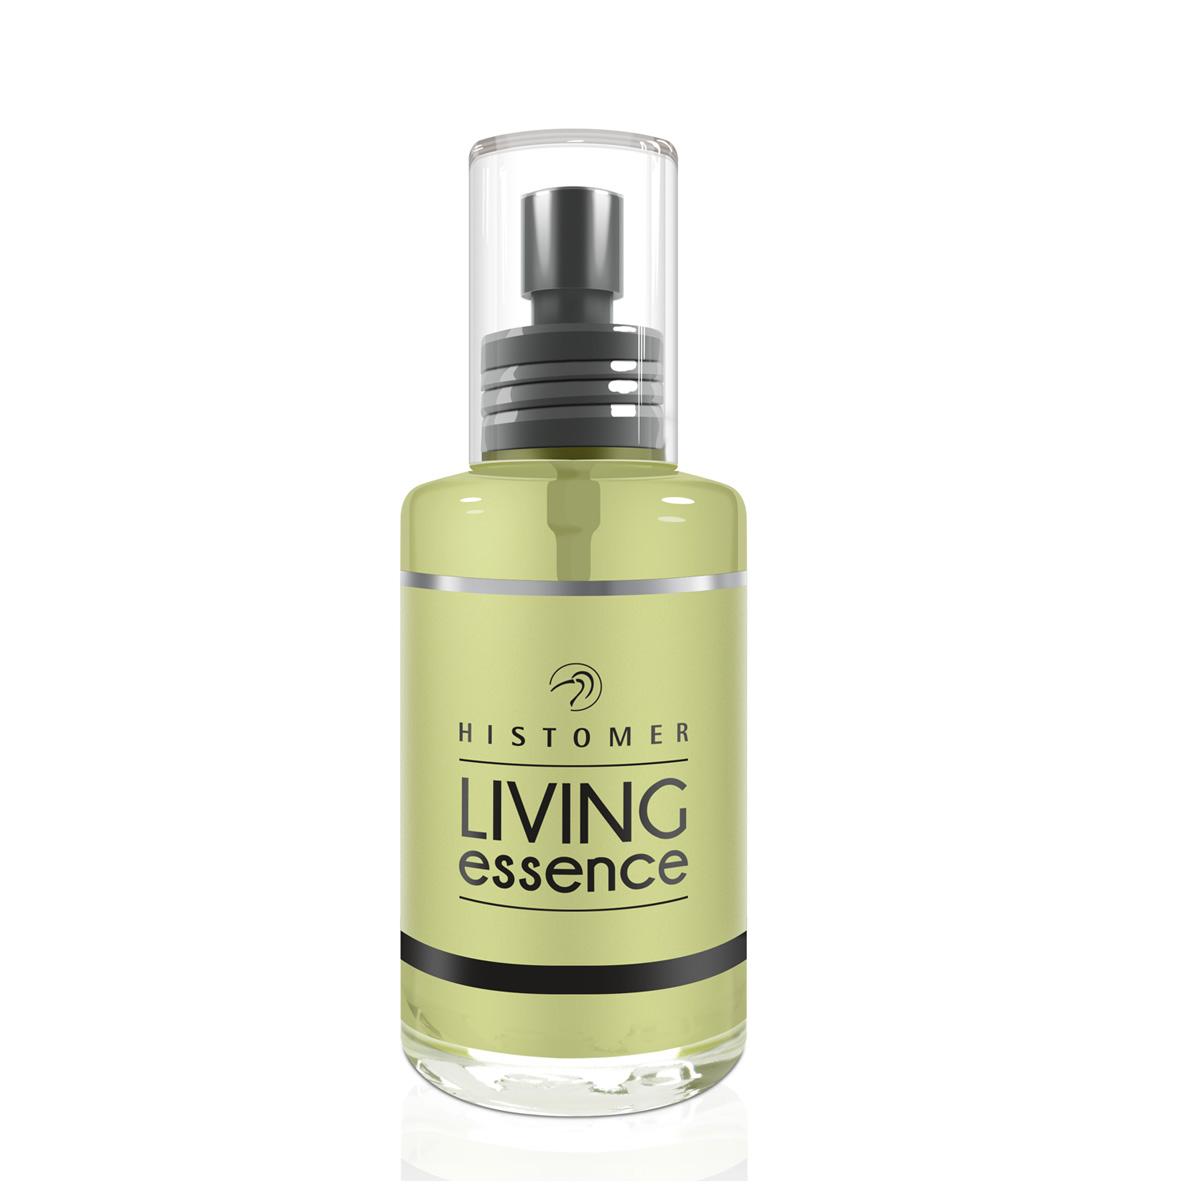 HISTOMER Композиция парфюмерная / Living Essence 100 мл